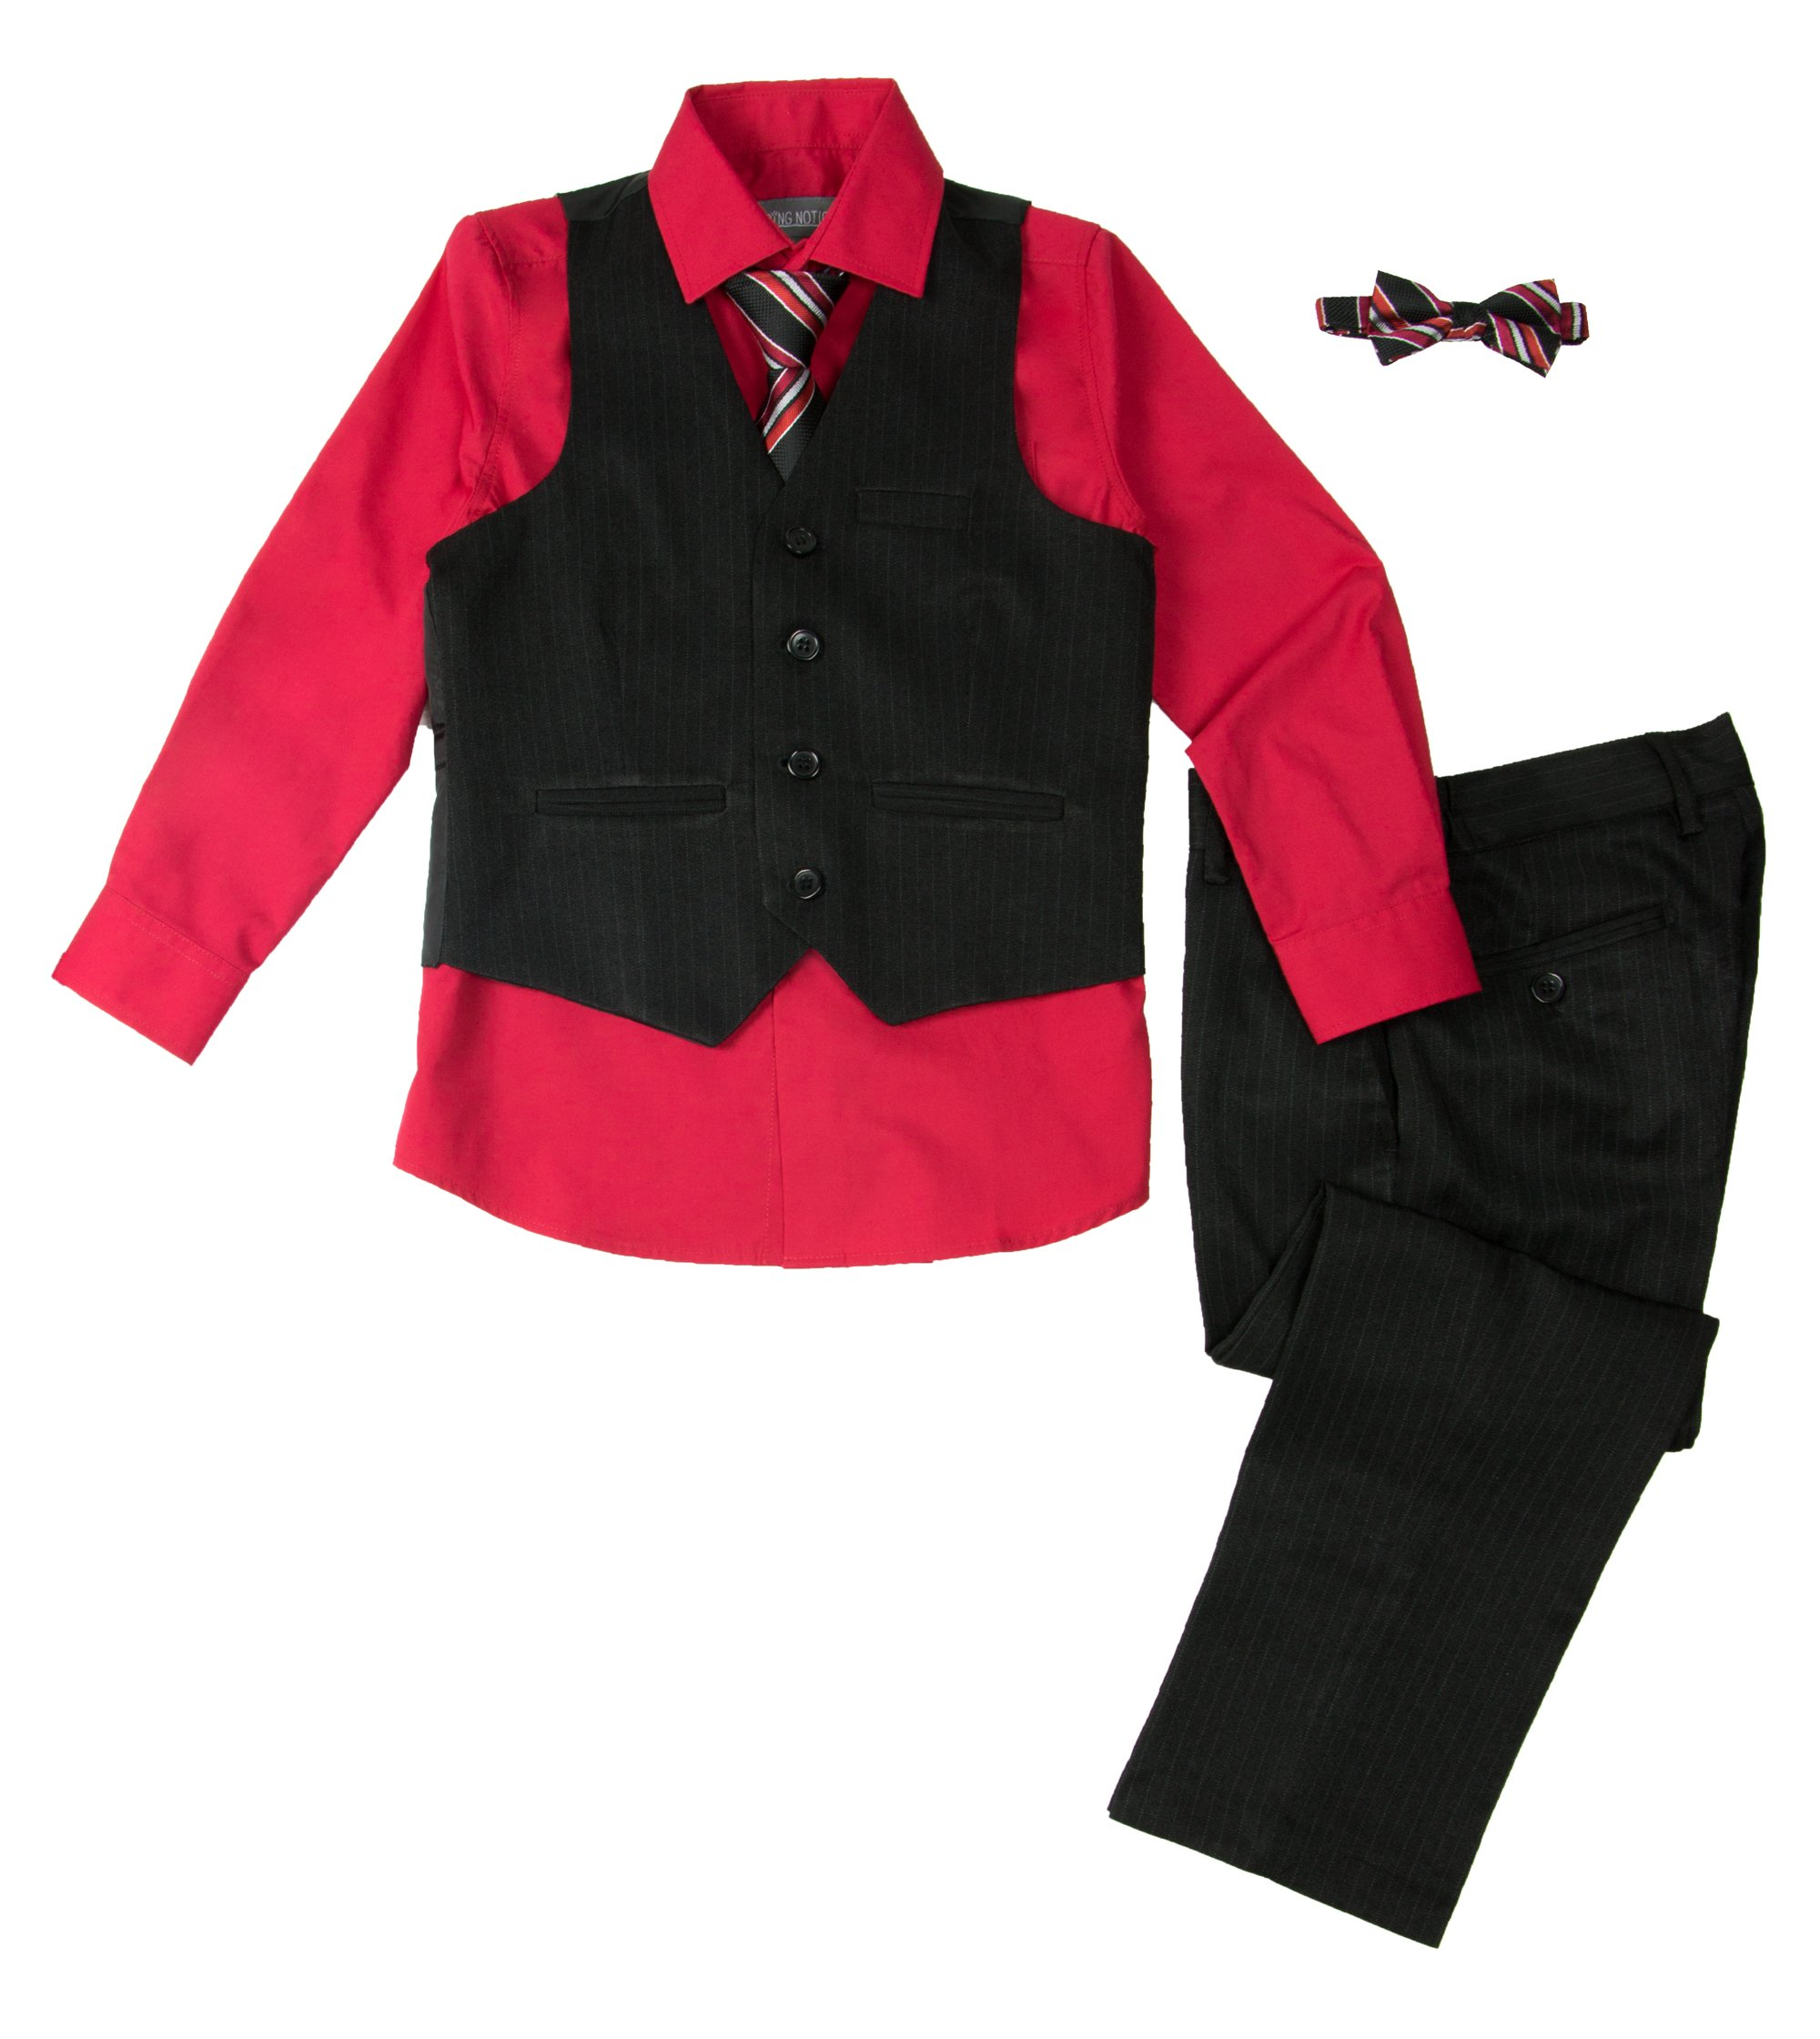 Spring Notion Baby Boys' 5 Piece Pinstripe Vest Set Lollipop 6M by Spring Notion